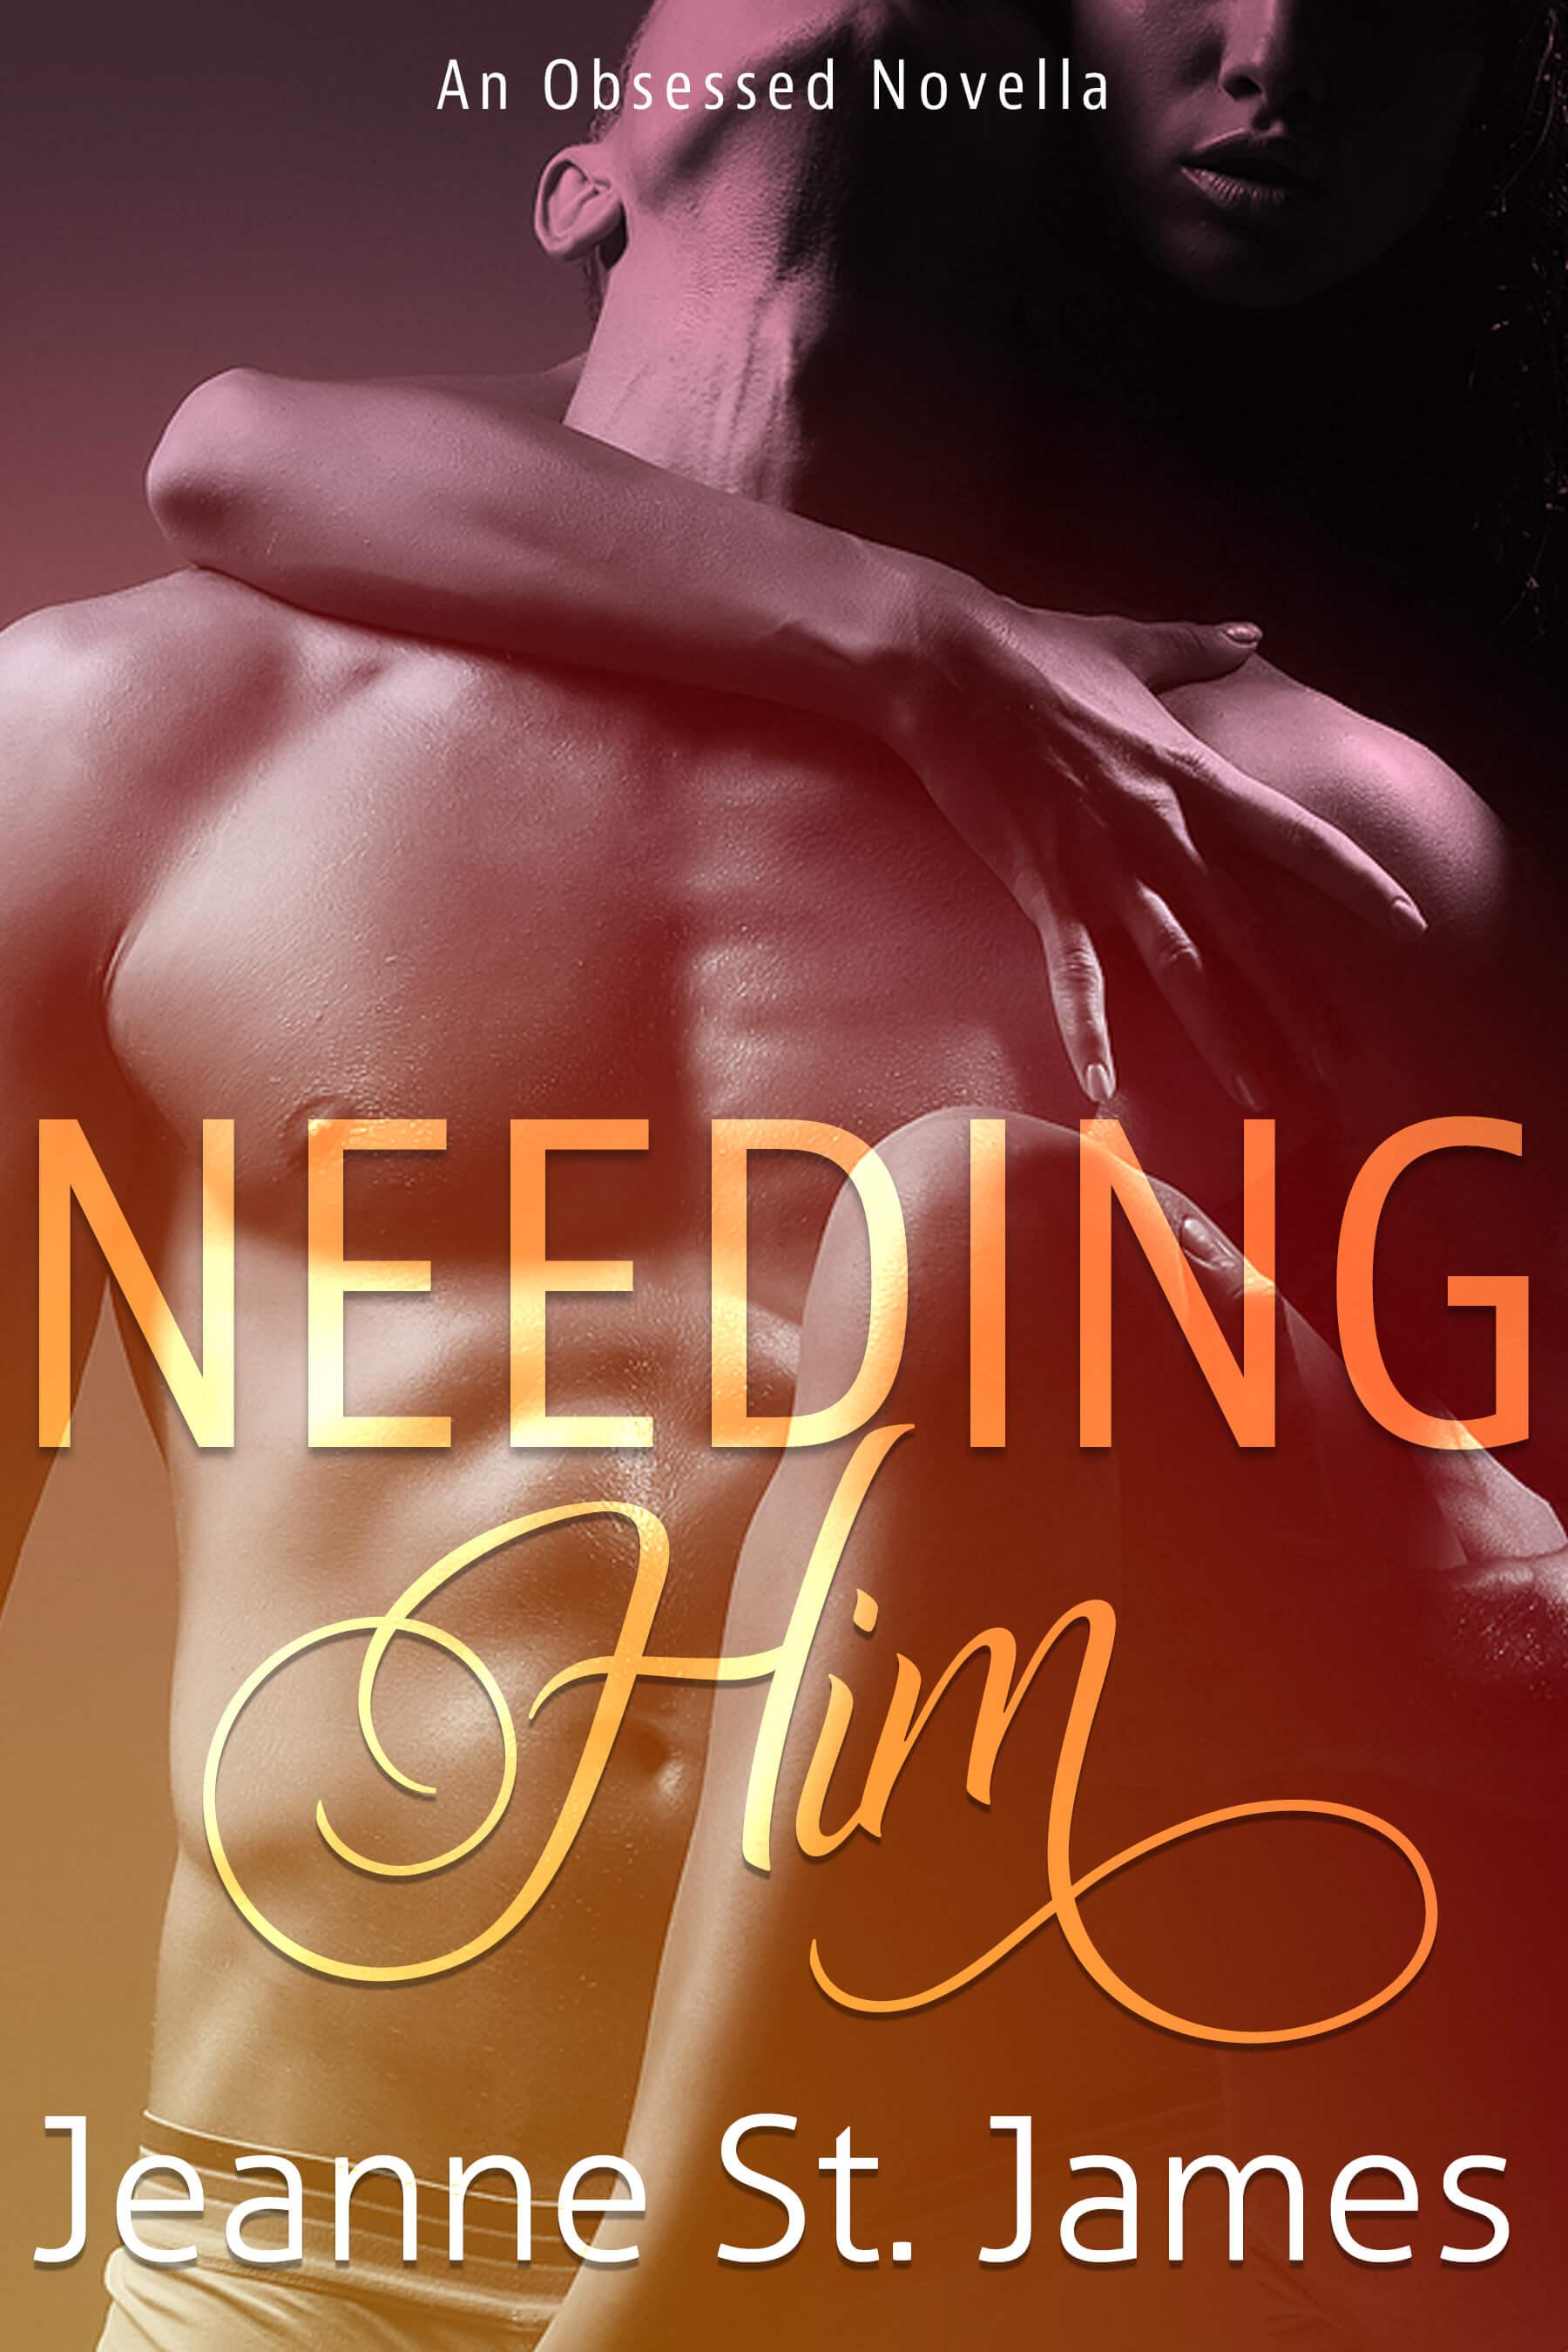 New Release! Jeanne St. James's Needing Him #newrelease #authorlove #jeannestjames #needinghim